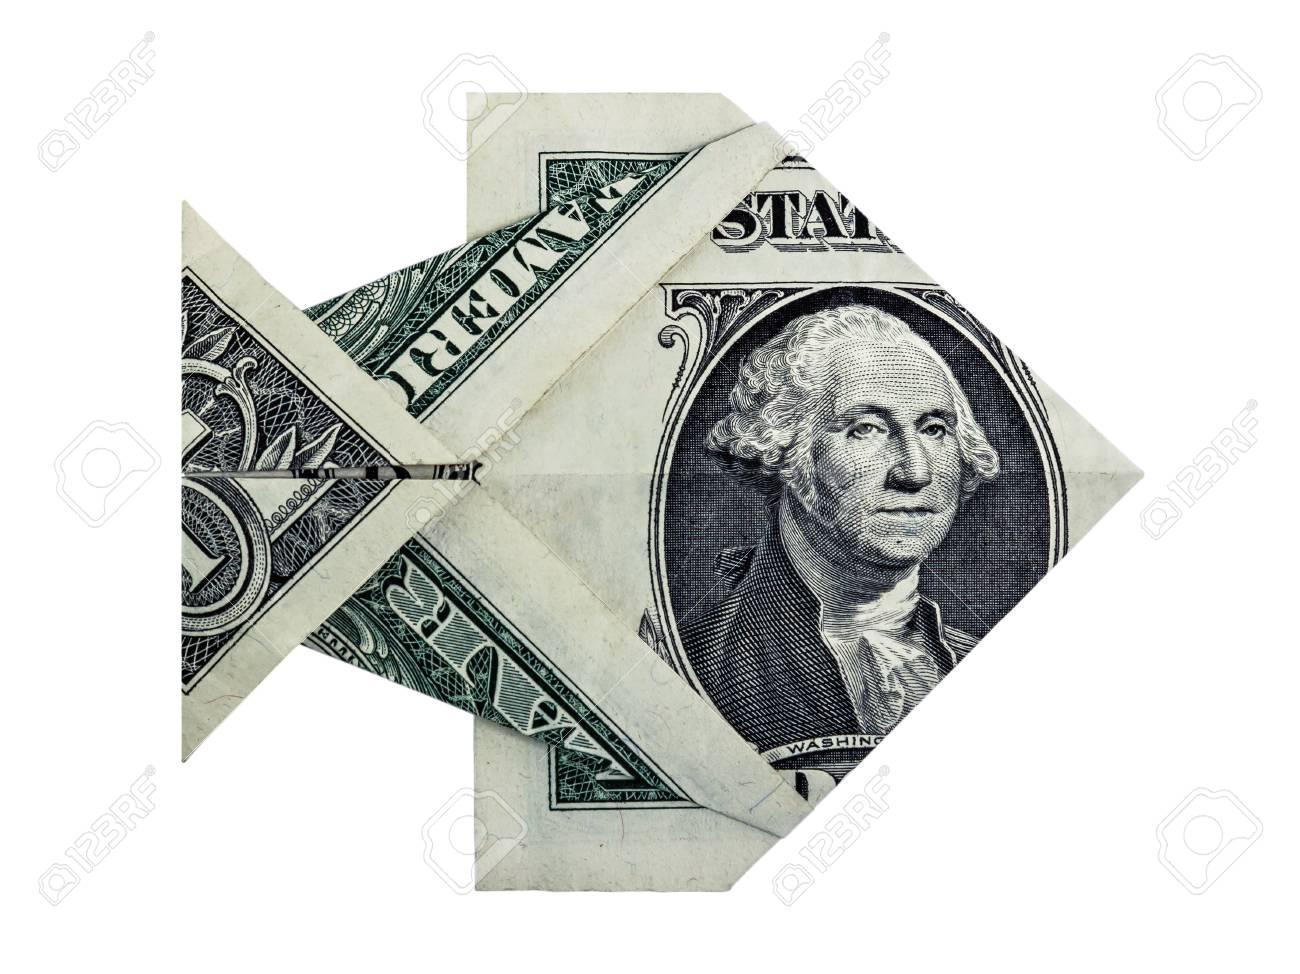 Origami dollar fish money symbol business on a white background origami dollar fish money symbol business on a white background stock photo 78284749 jeuxipadfo Choice Image